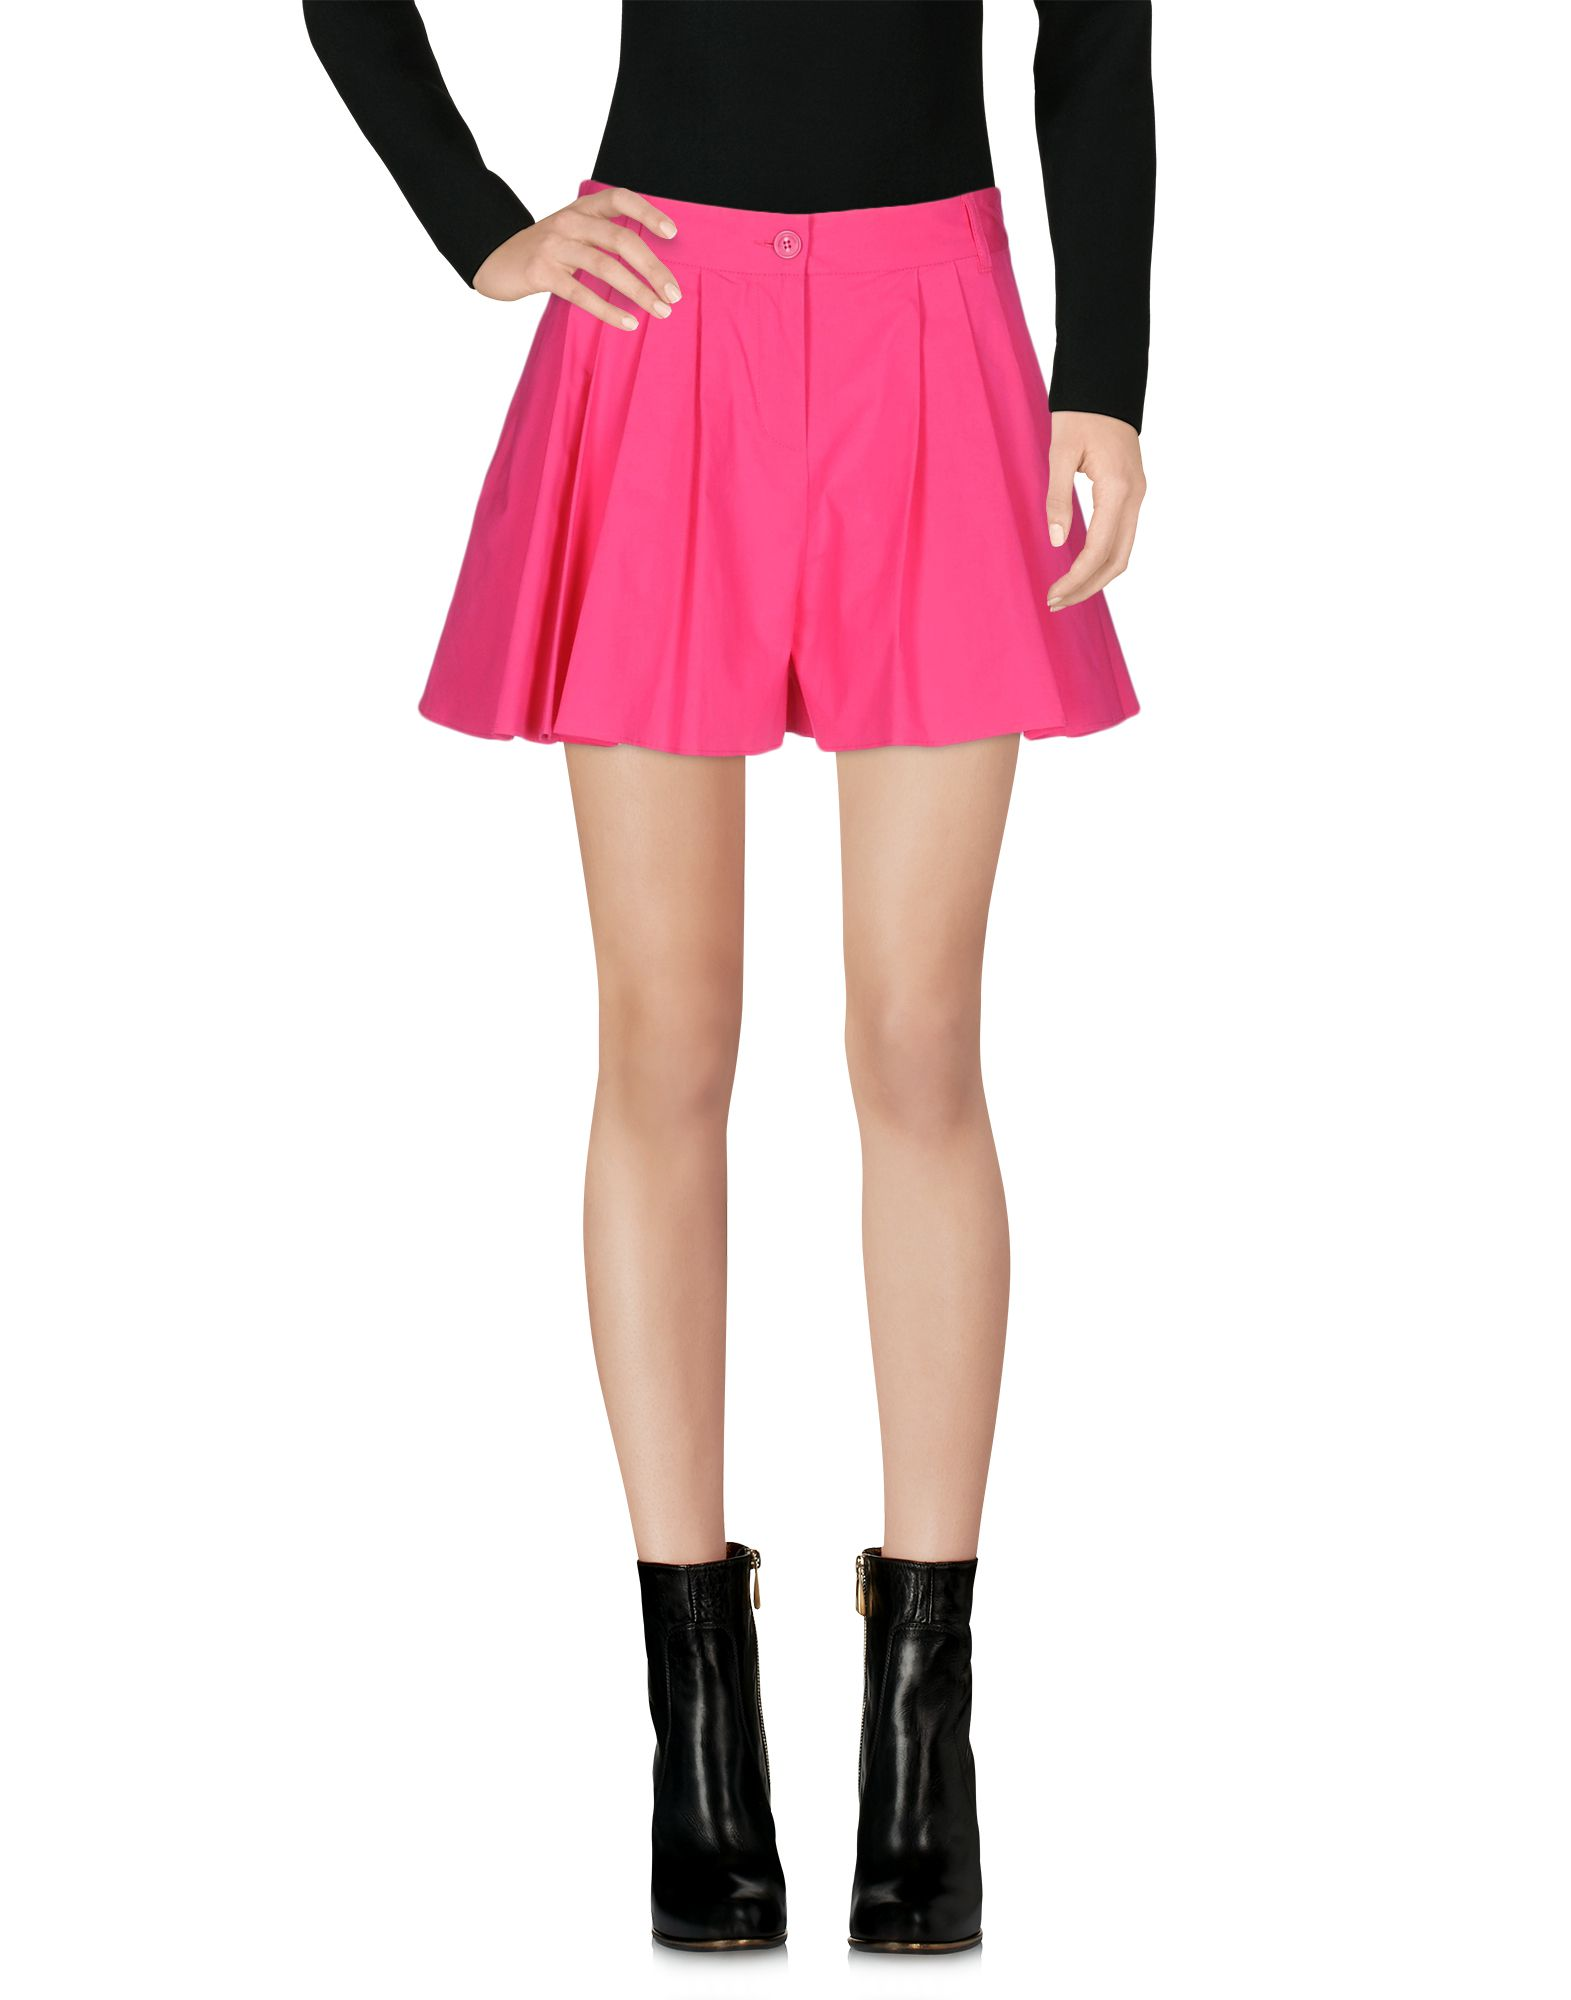 MOSCHINO CHEAP AND CHIC Мини-юбка moschino юбка брюки от moschino 99376